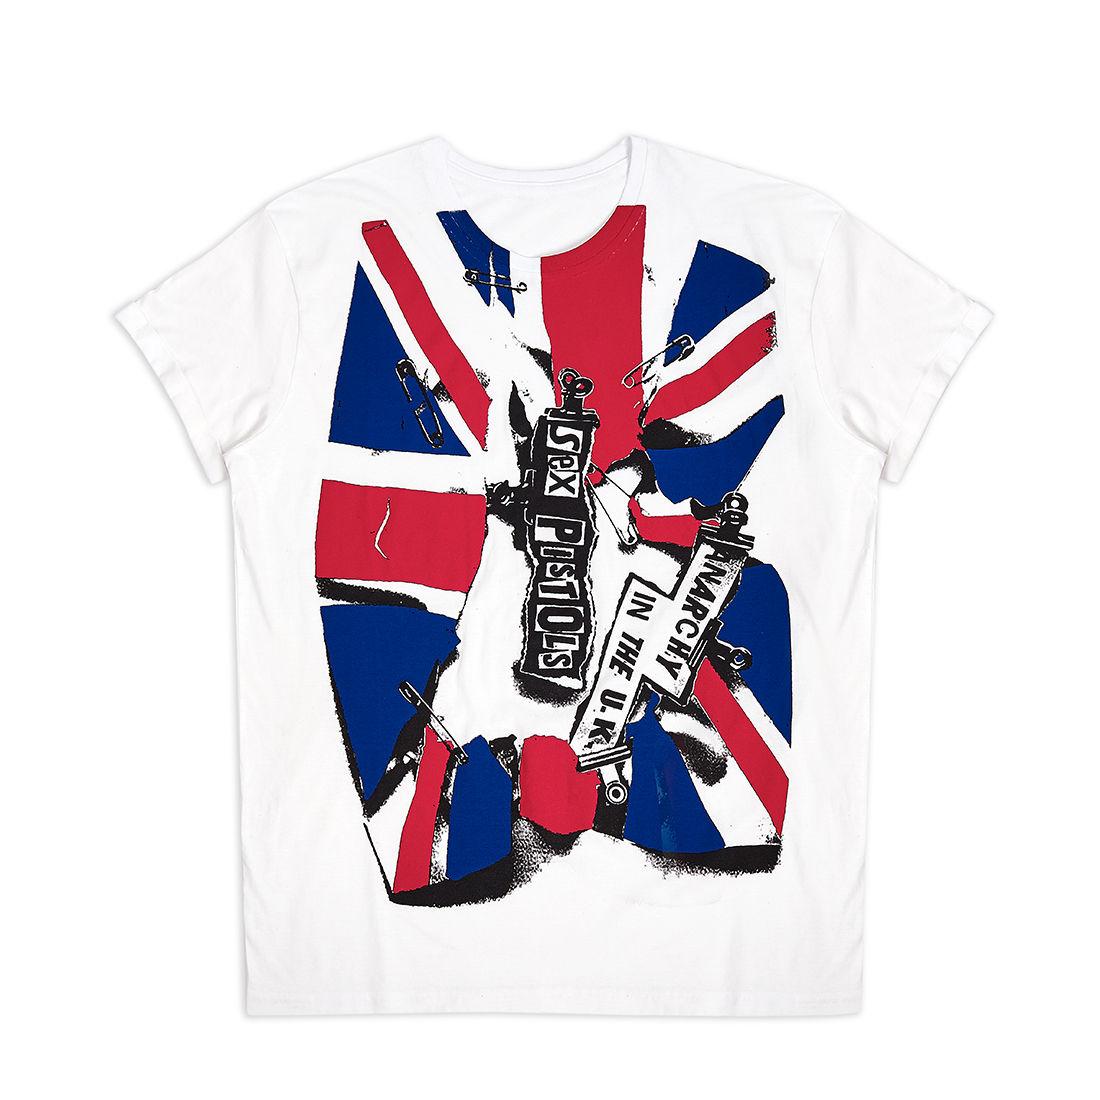 cbe378a309e Sex Pistols  ANARCHY IN THE UK T-Shirt - L